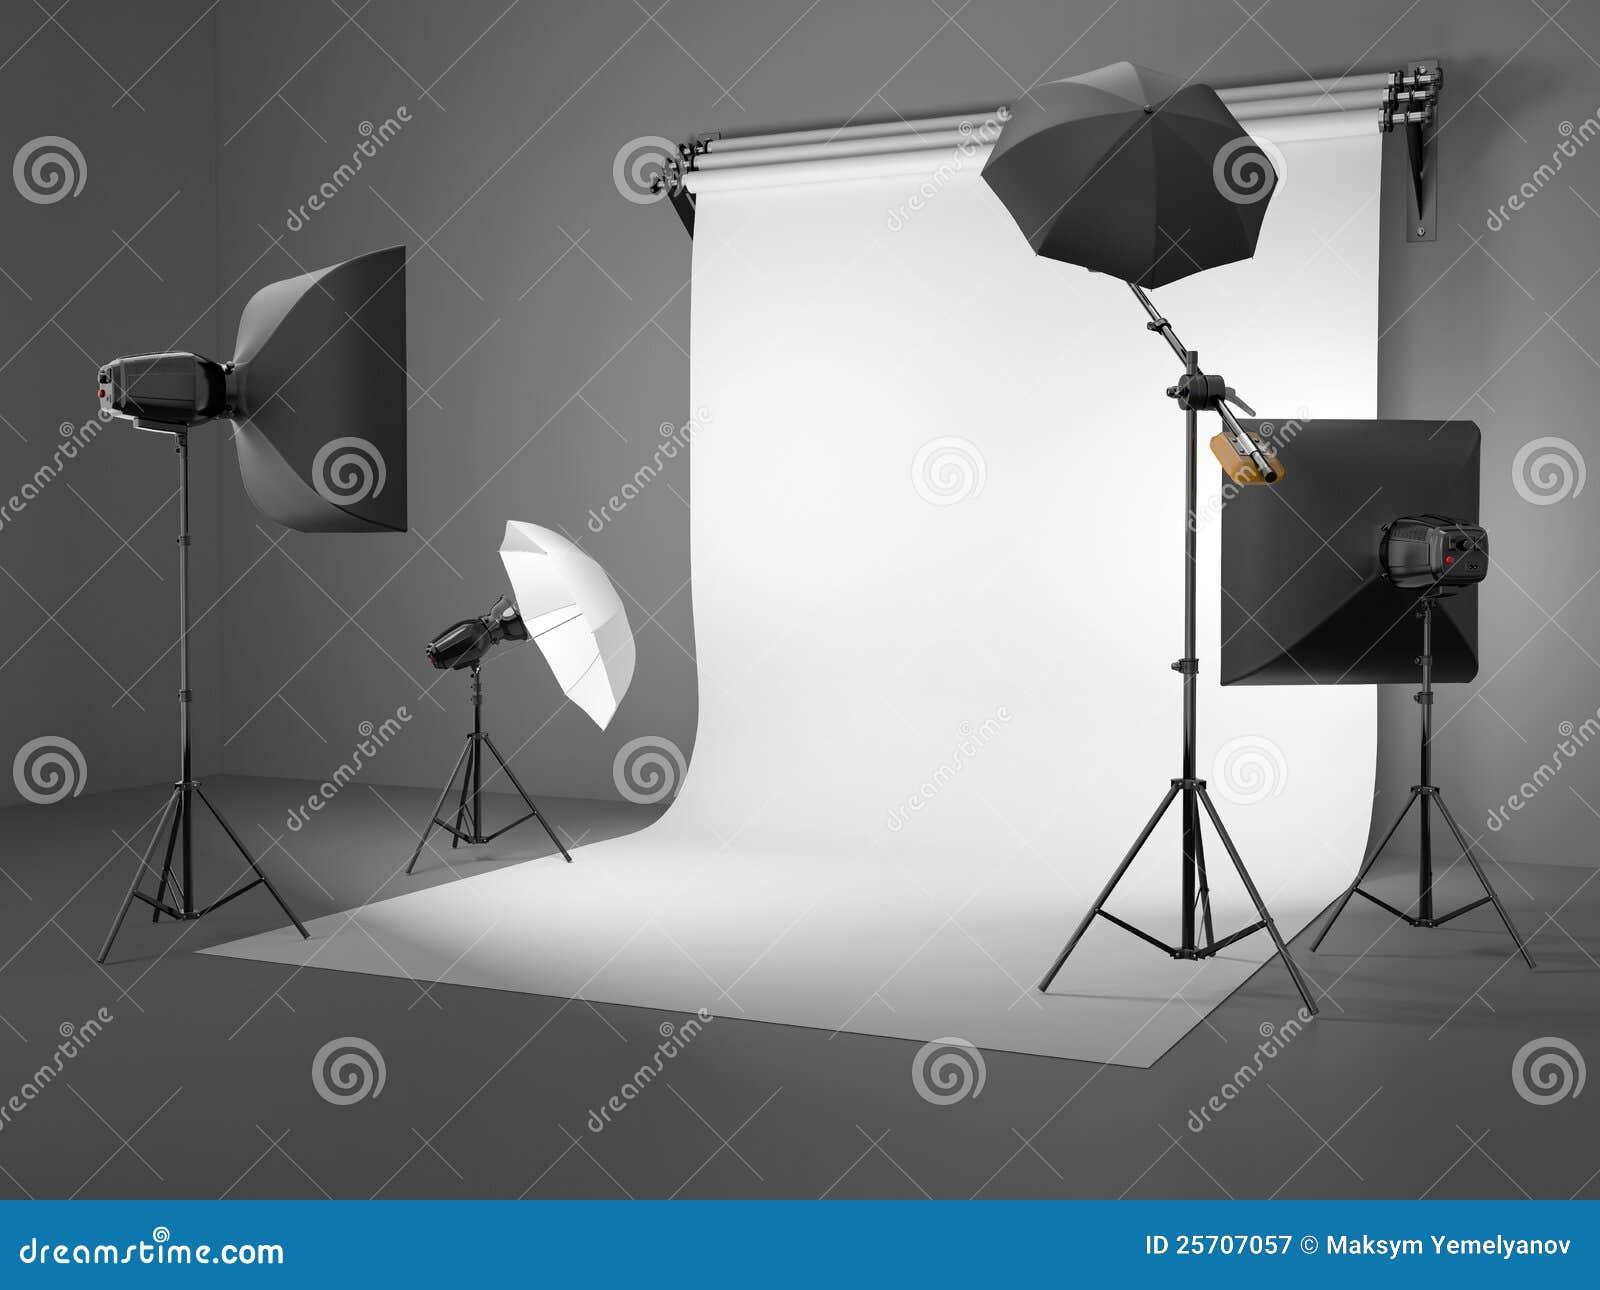 astronomy photography equipment - photo #26